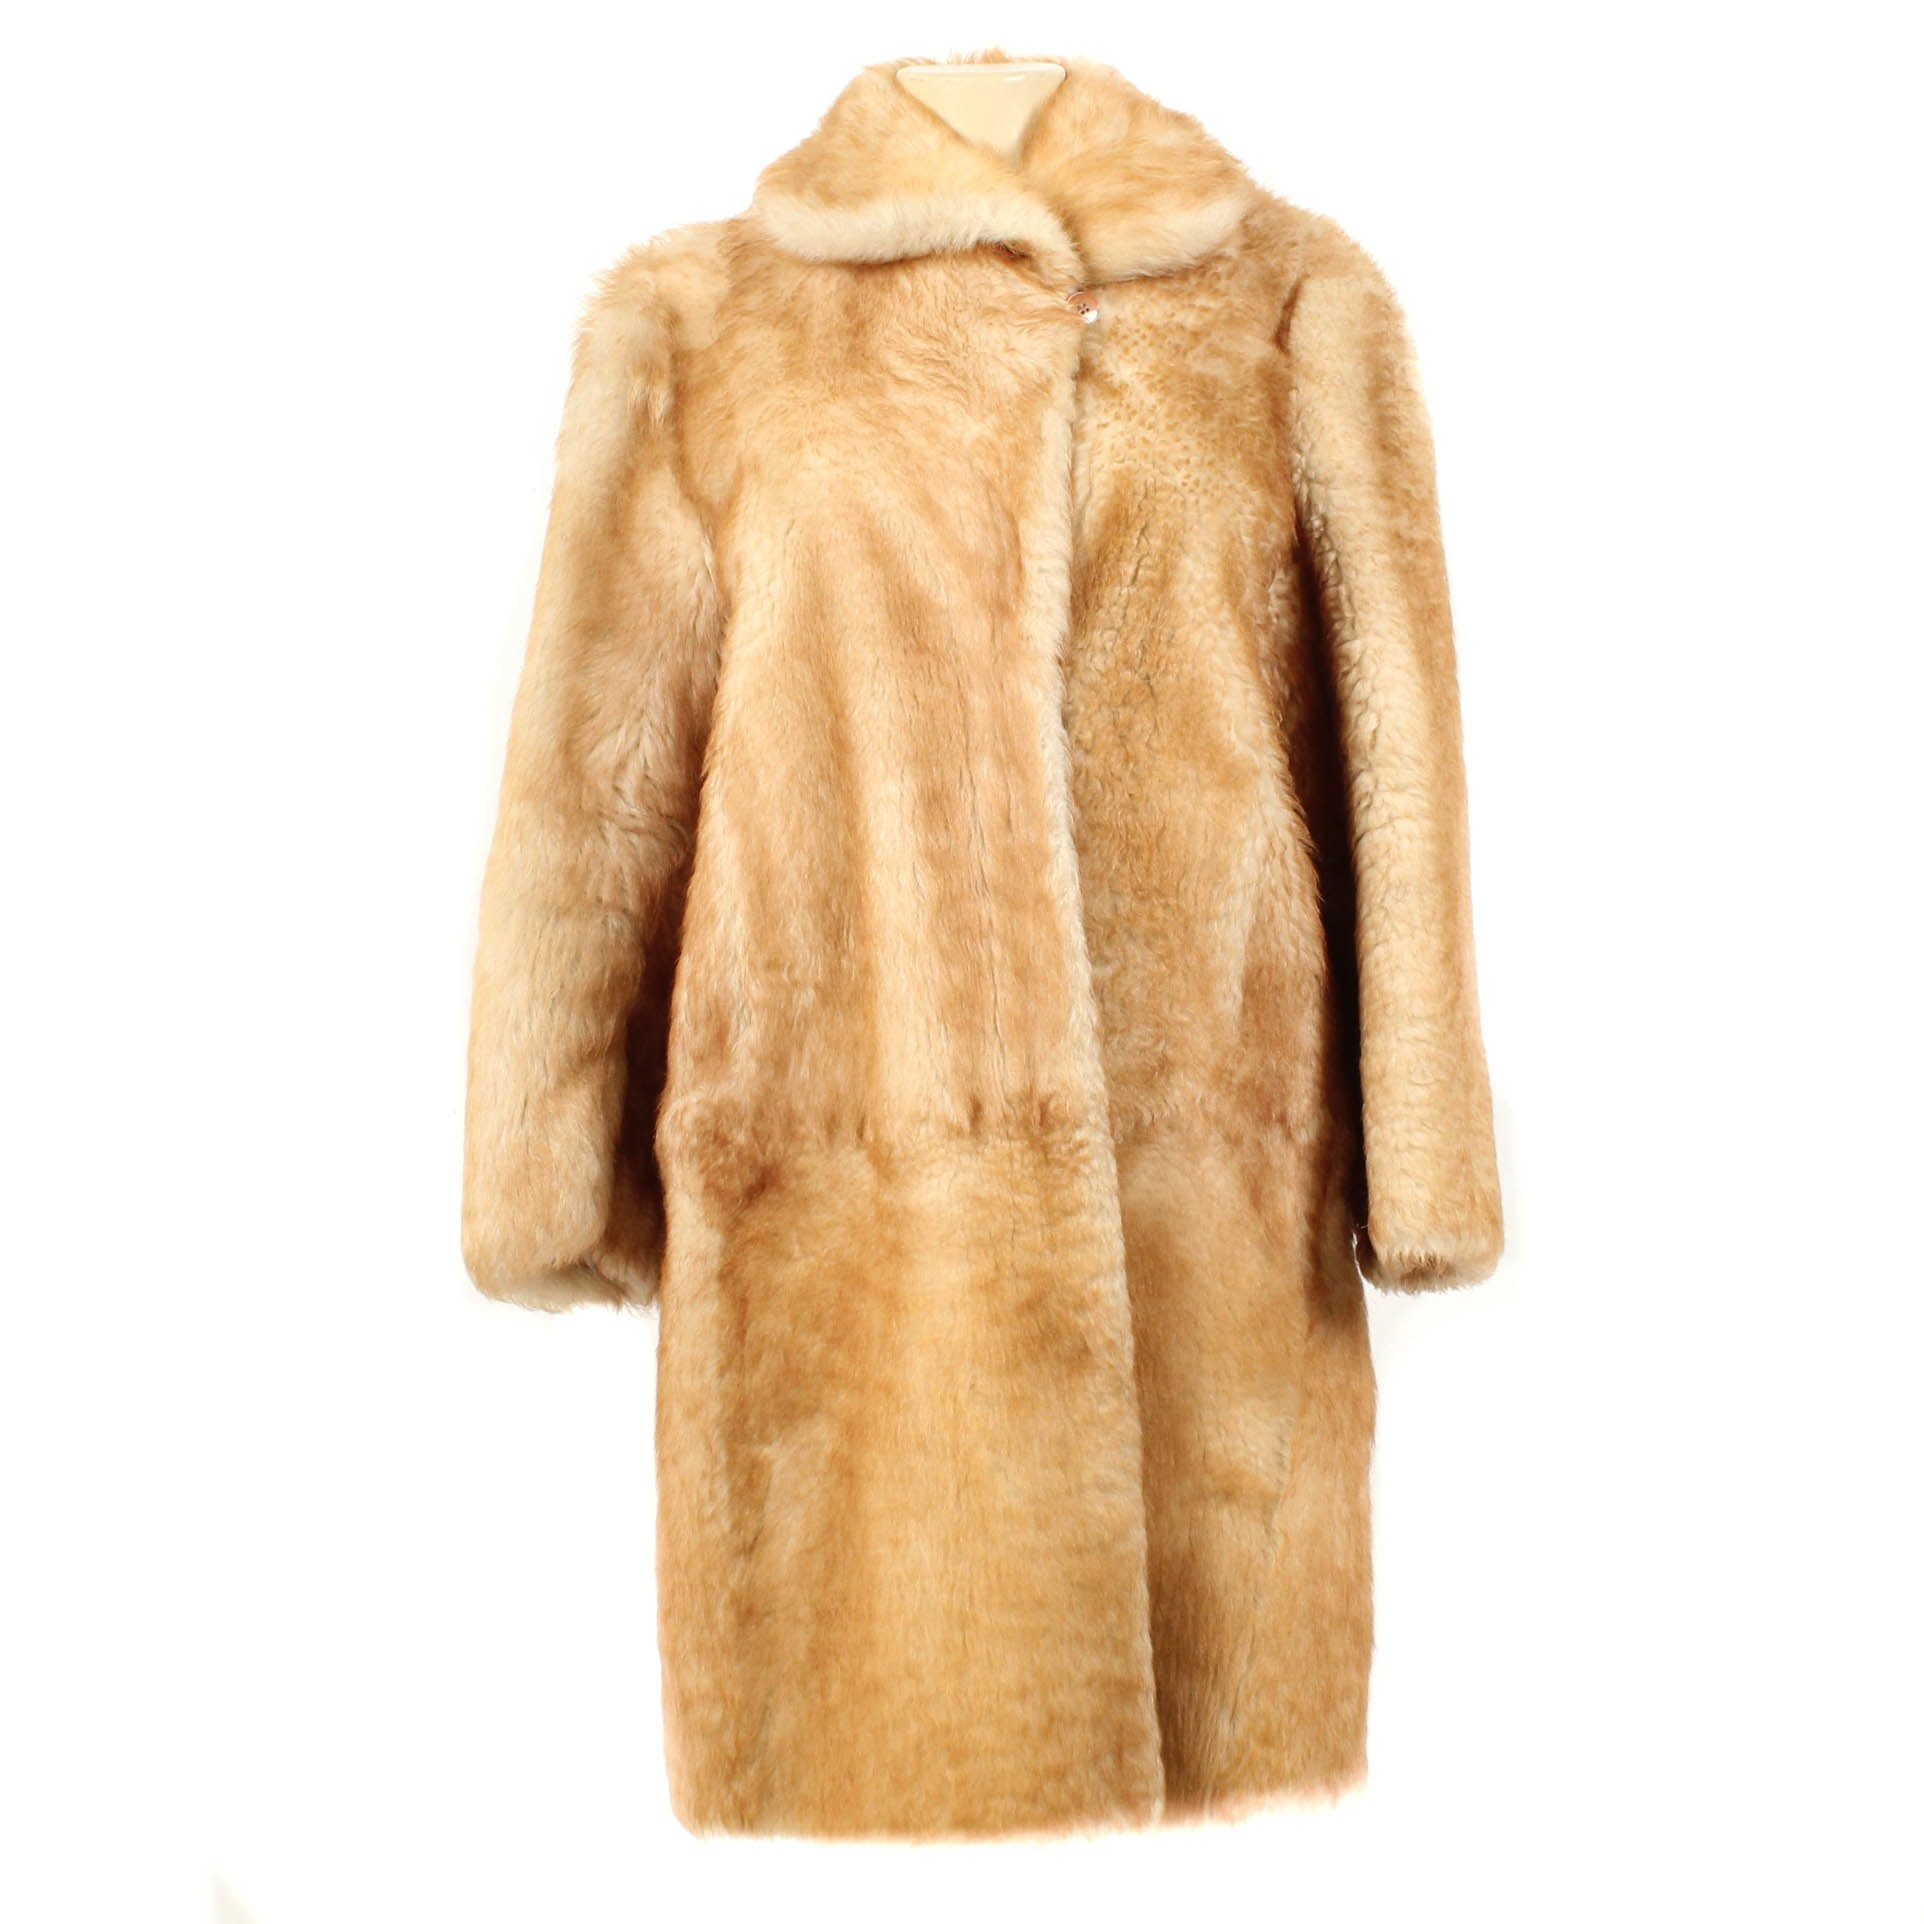 Vintage Lamb Shearling Coat